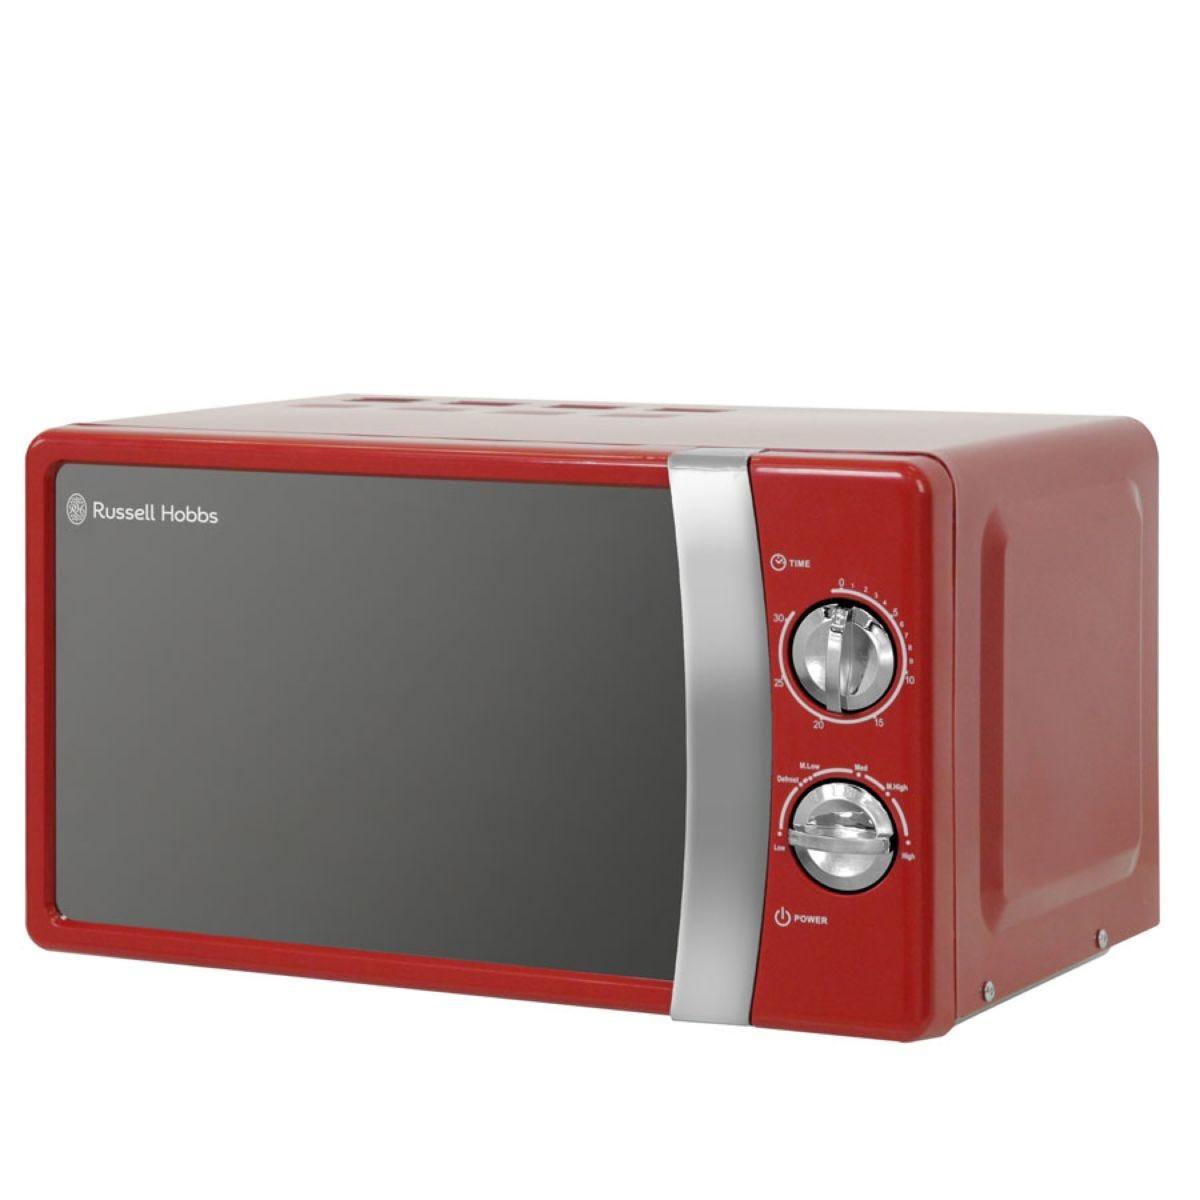 Russell Hobbs 700W 17L Manual Microwave